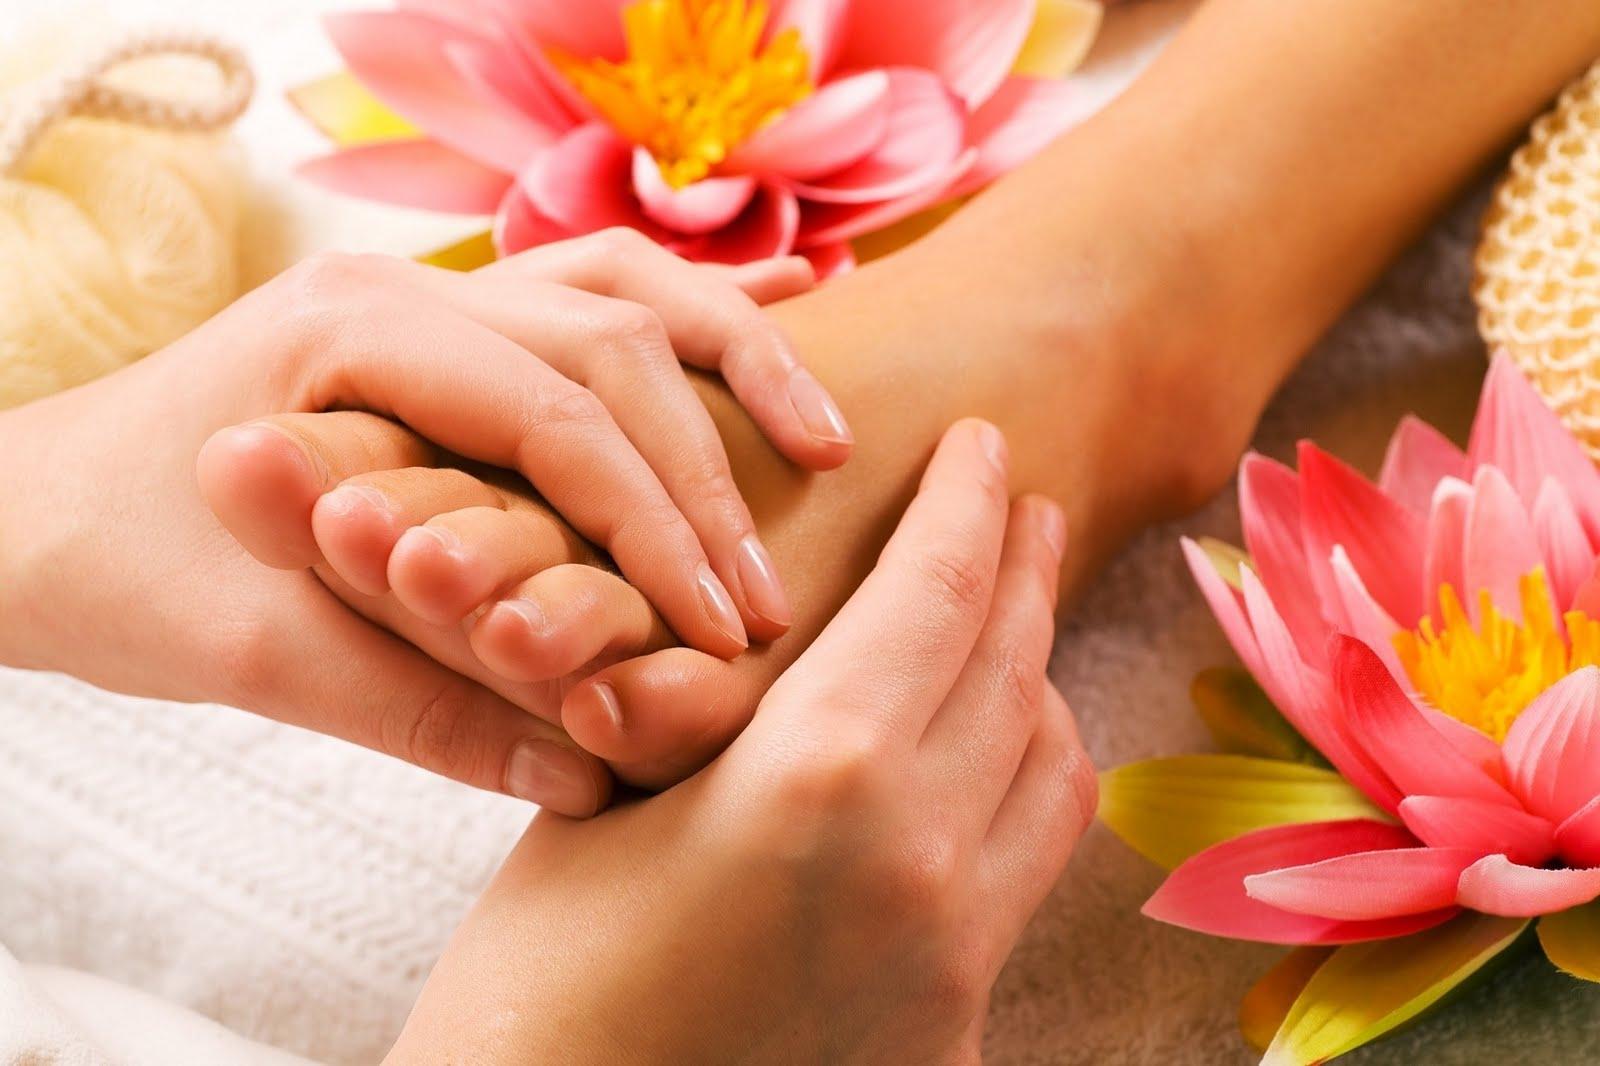 foot_massage1.jpg